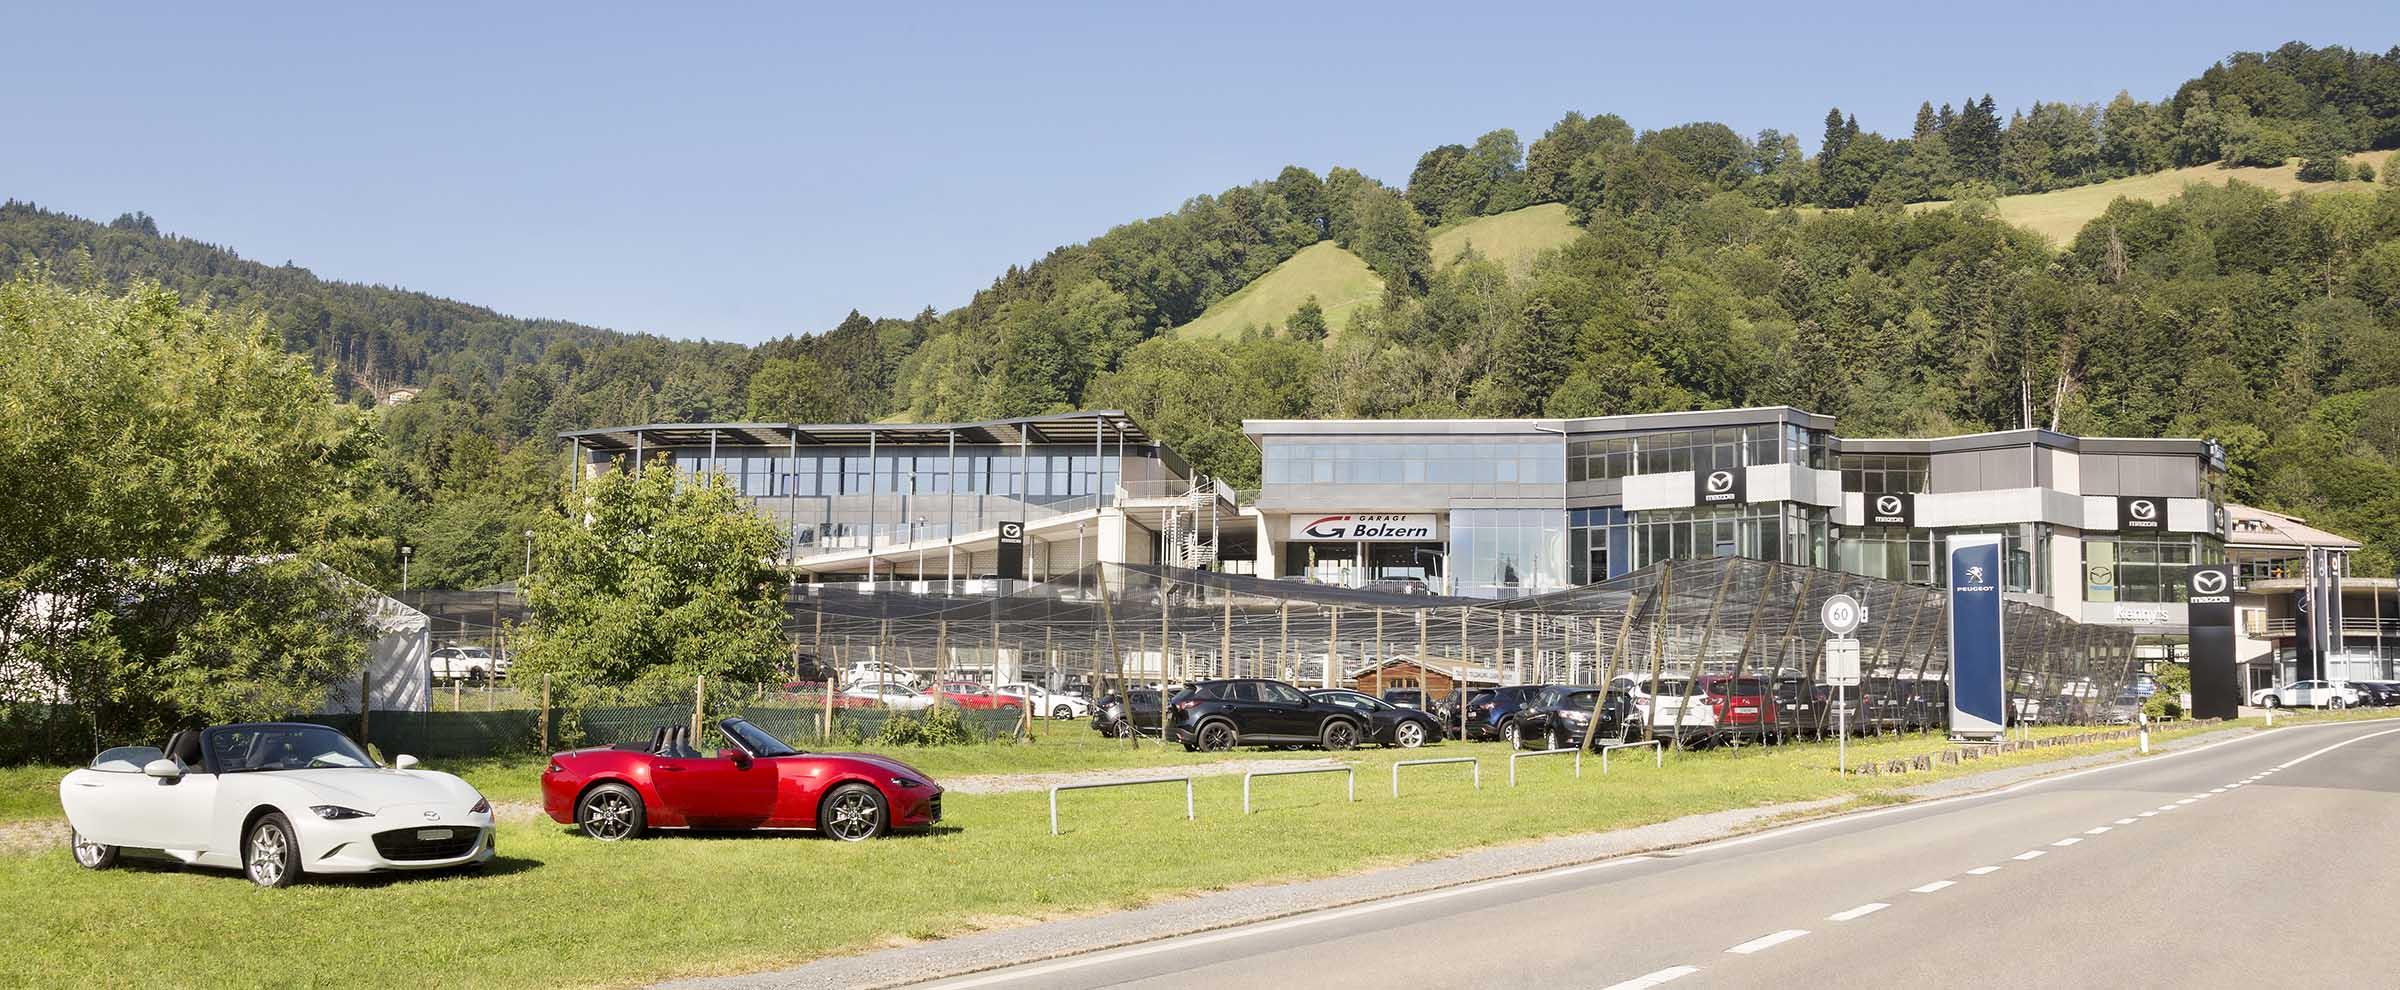 Garage Bolzern Kriens-Obernau Luzern